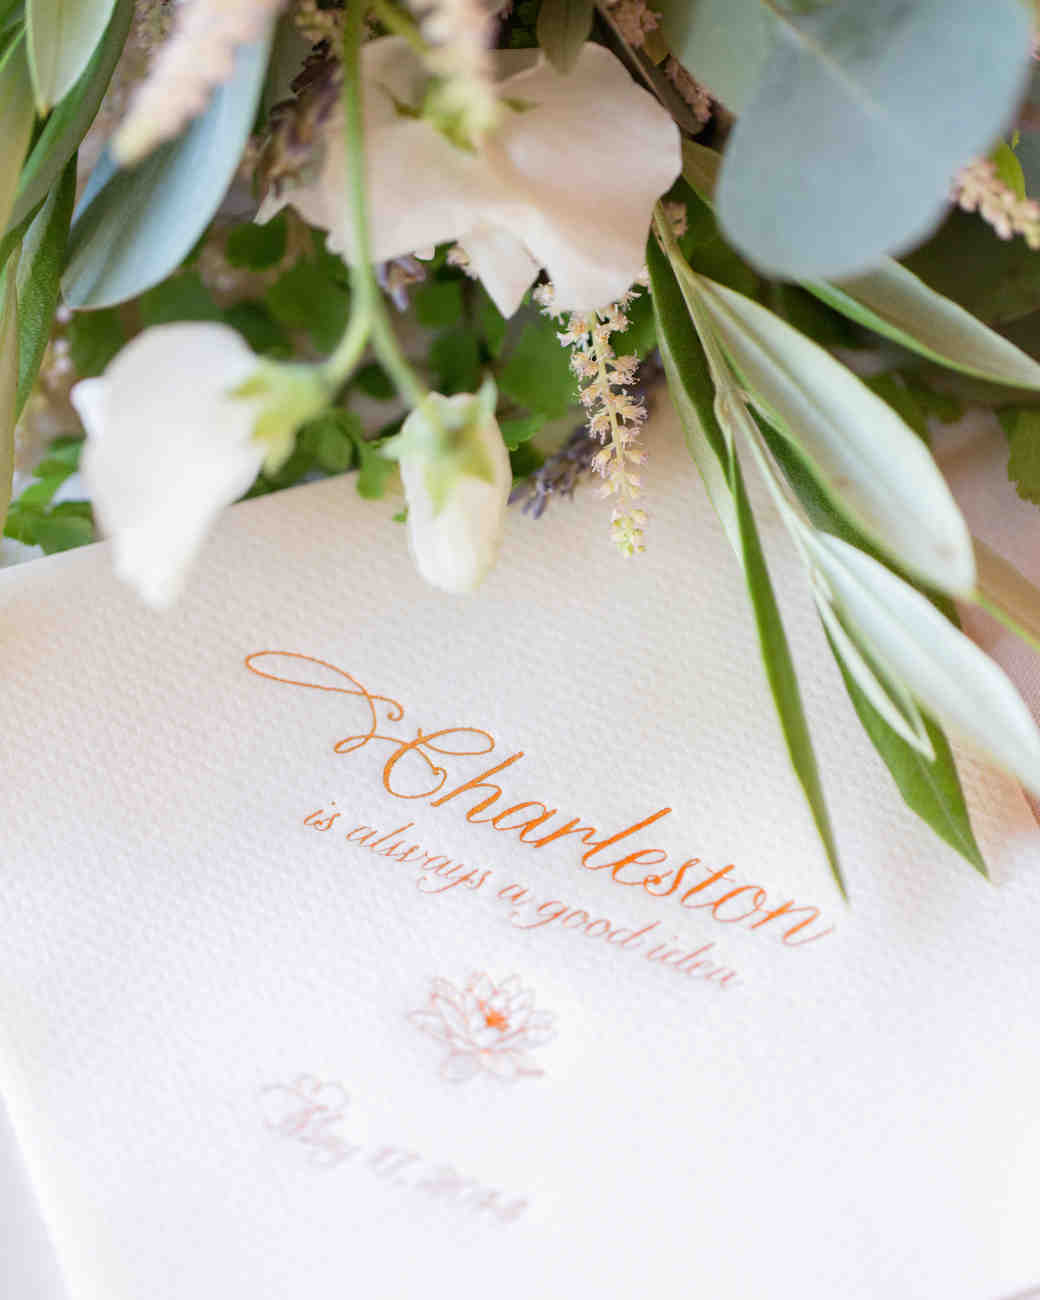 catherine-adrien-wedding-napkin-0763-s111414-0814.jpg